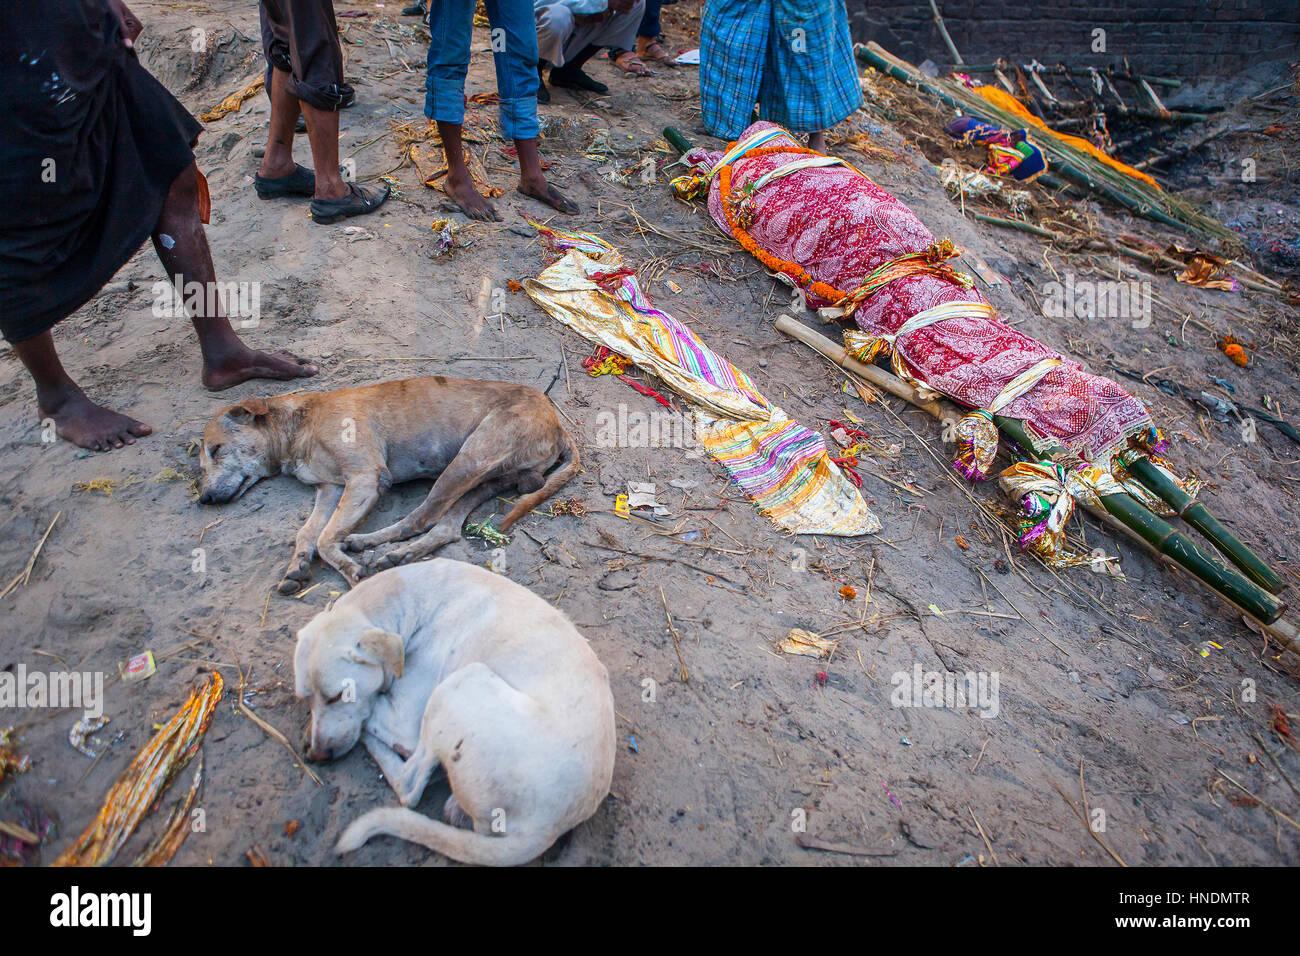 Body waiting to be burn, in Manikarnika Ghat, the burning ghat, on the banks of Ganges river, Varanasi, Uttar Pradesh, - Stock Image